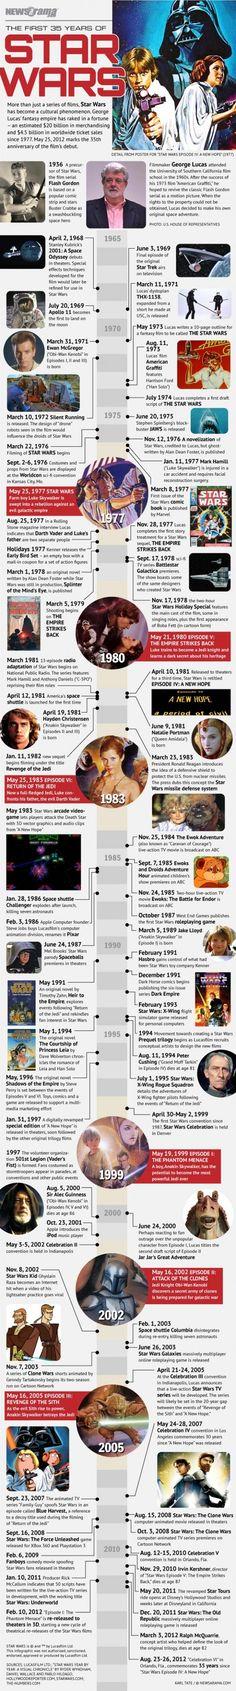 star-wars-35-years-infographic-02...THIIIISSS IISSSS AWESOMMEE